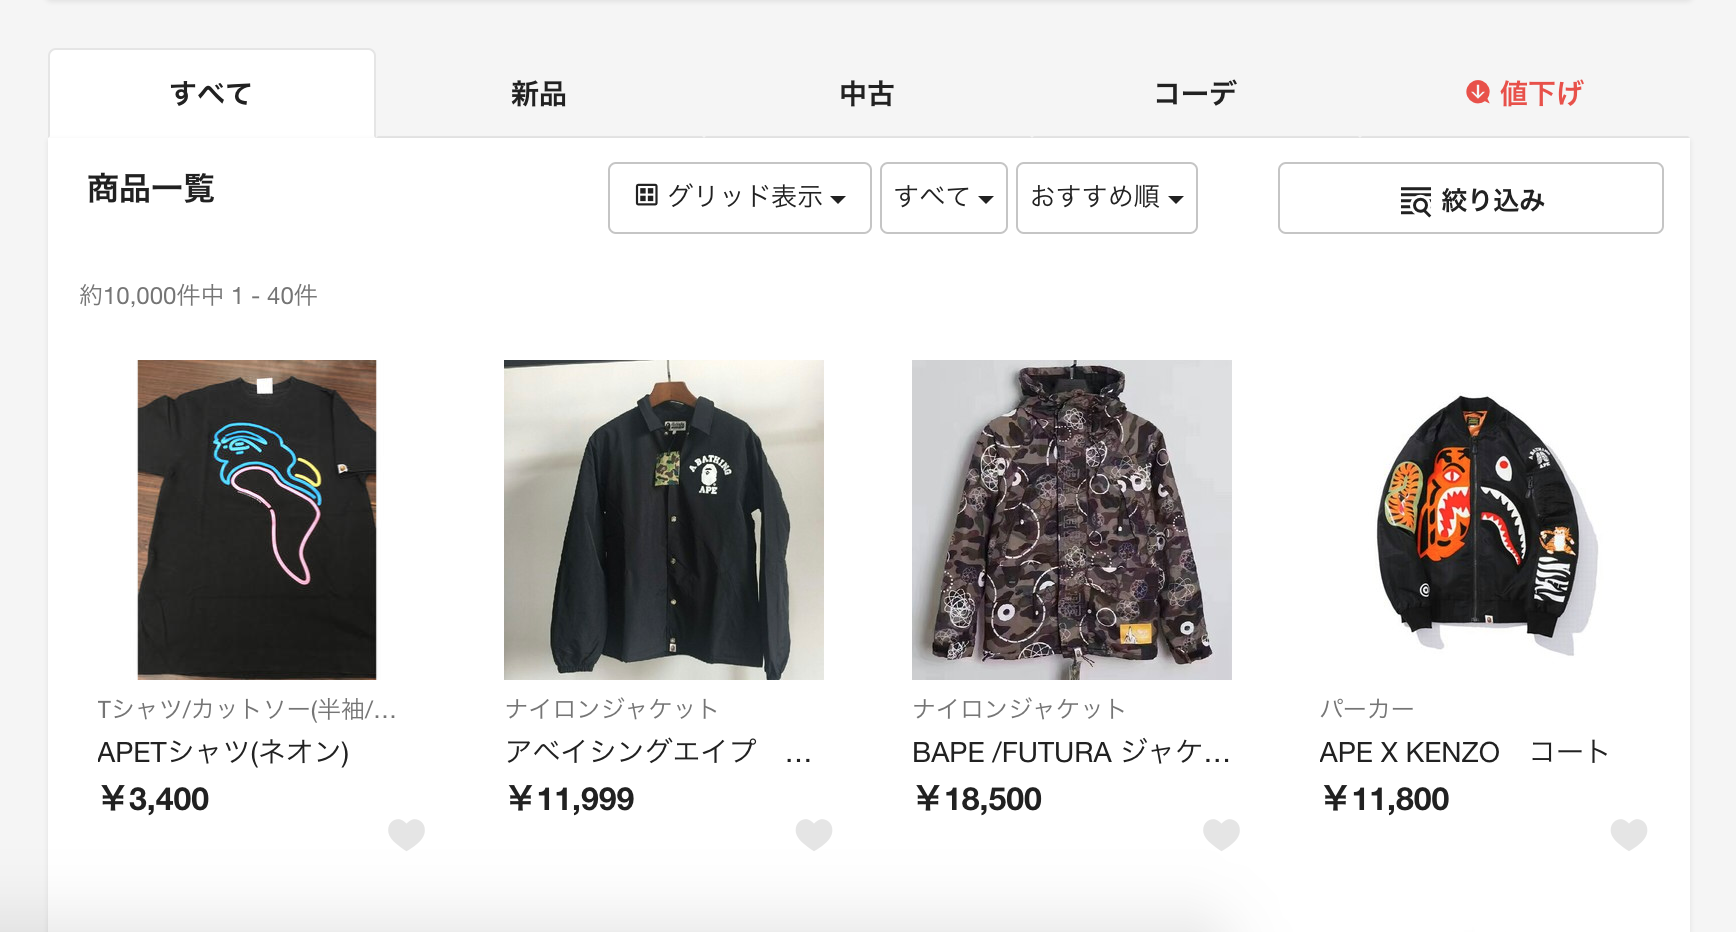 rakuma product listing